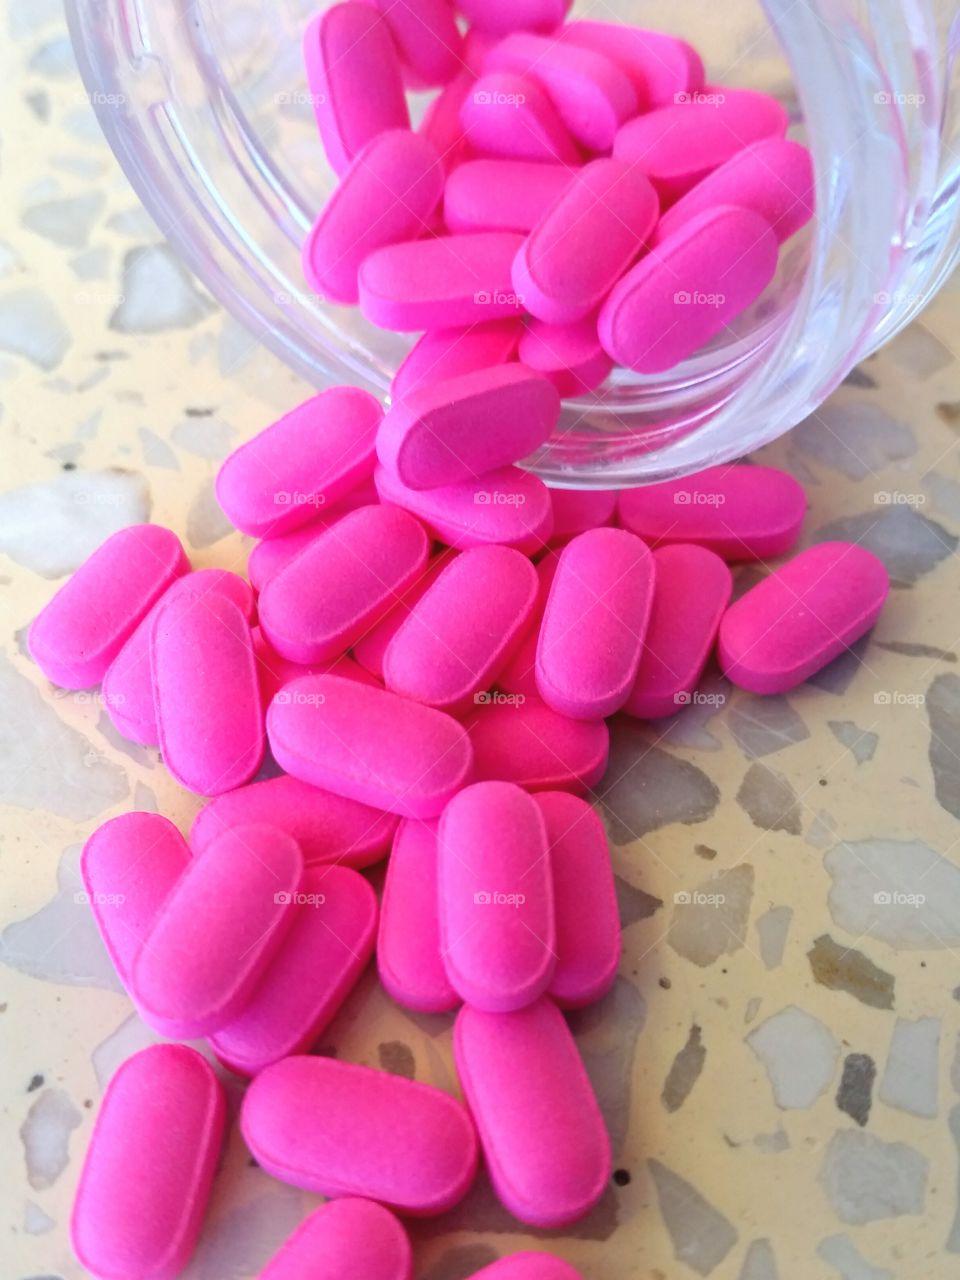 Pink pills tumbling out of jar